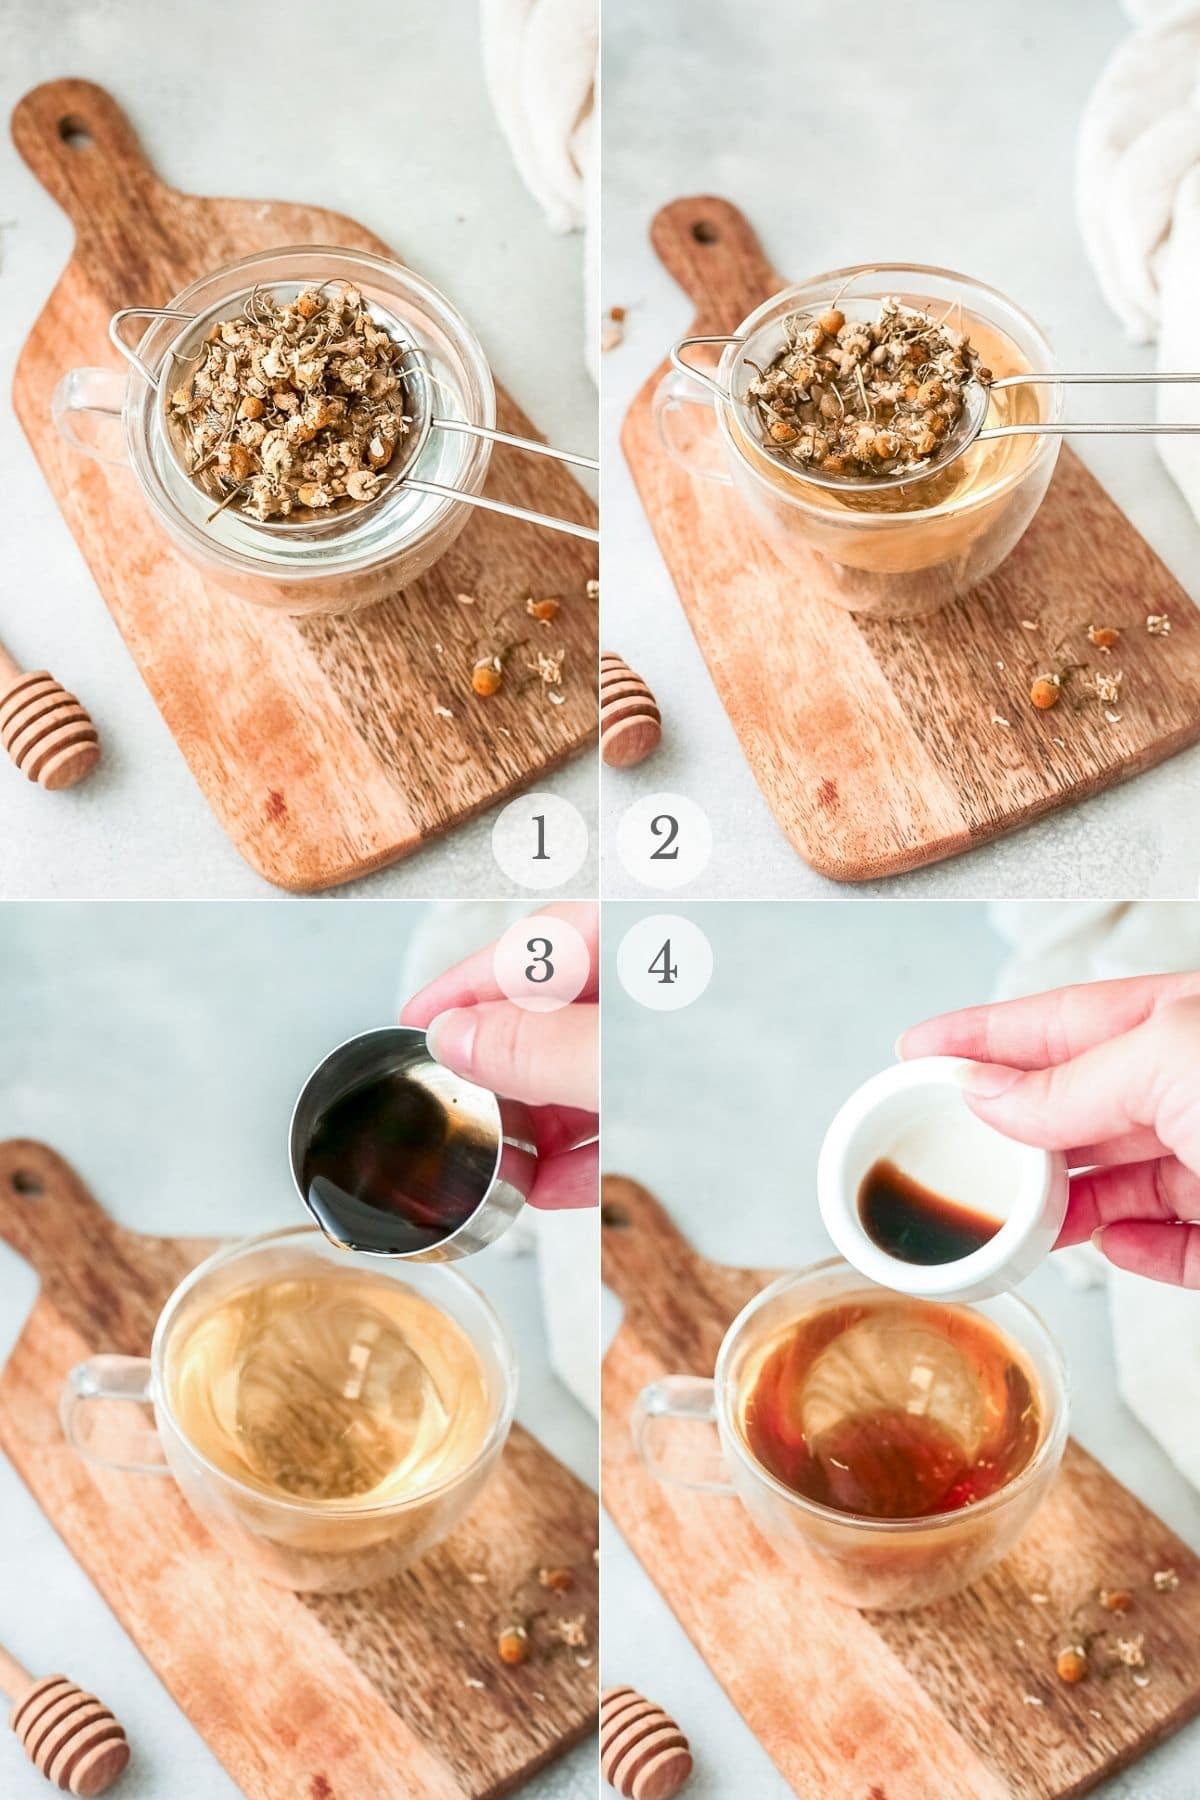 tea latte recipe steps 1-4